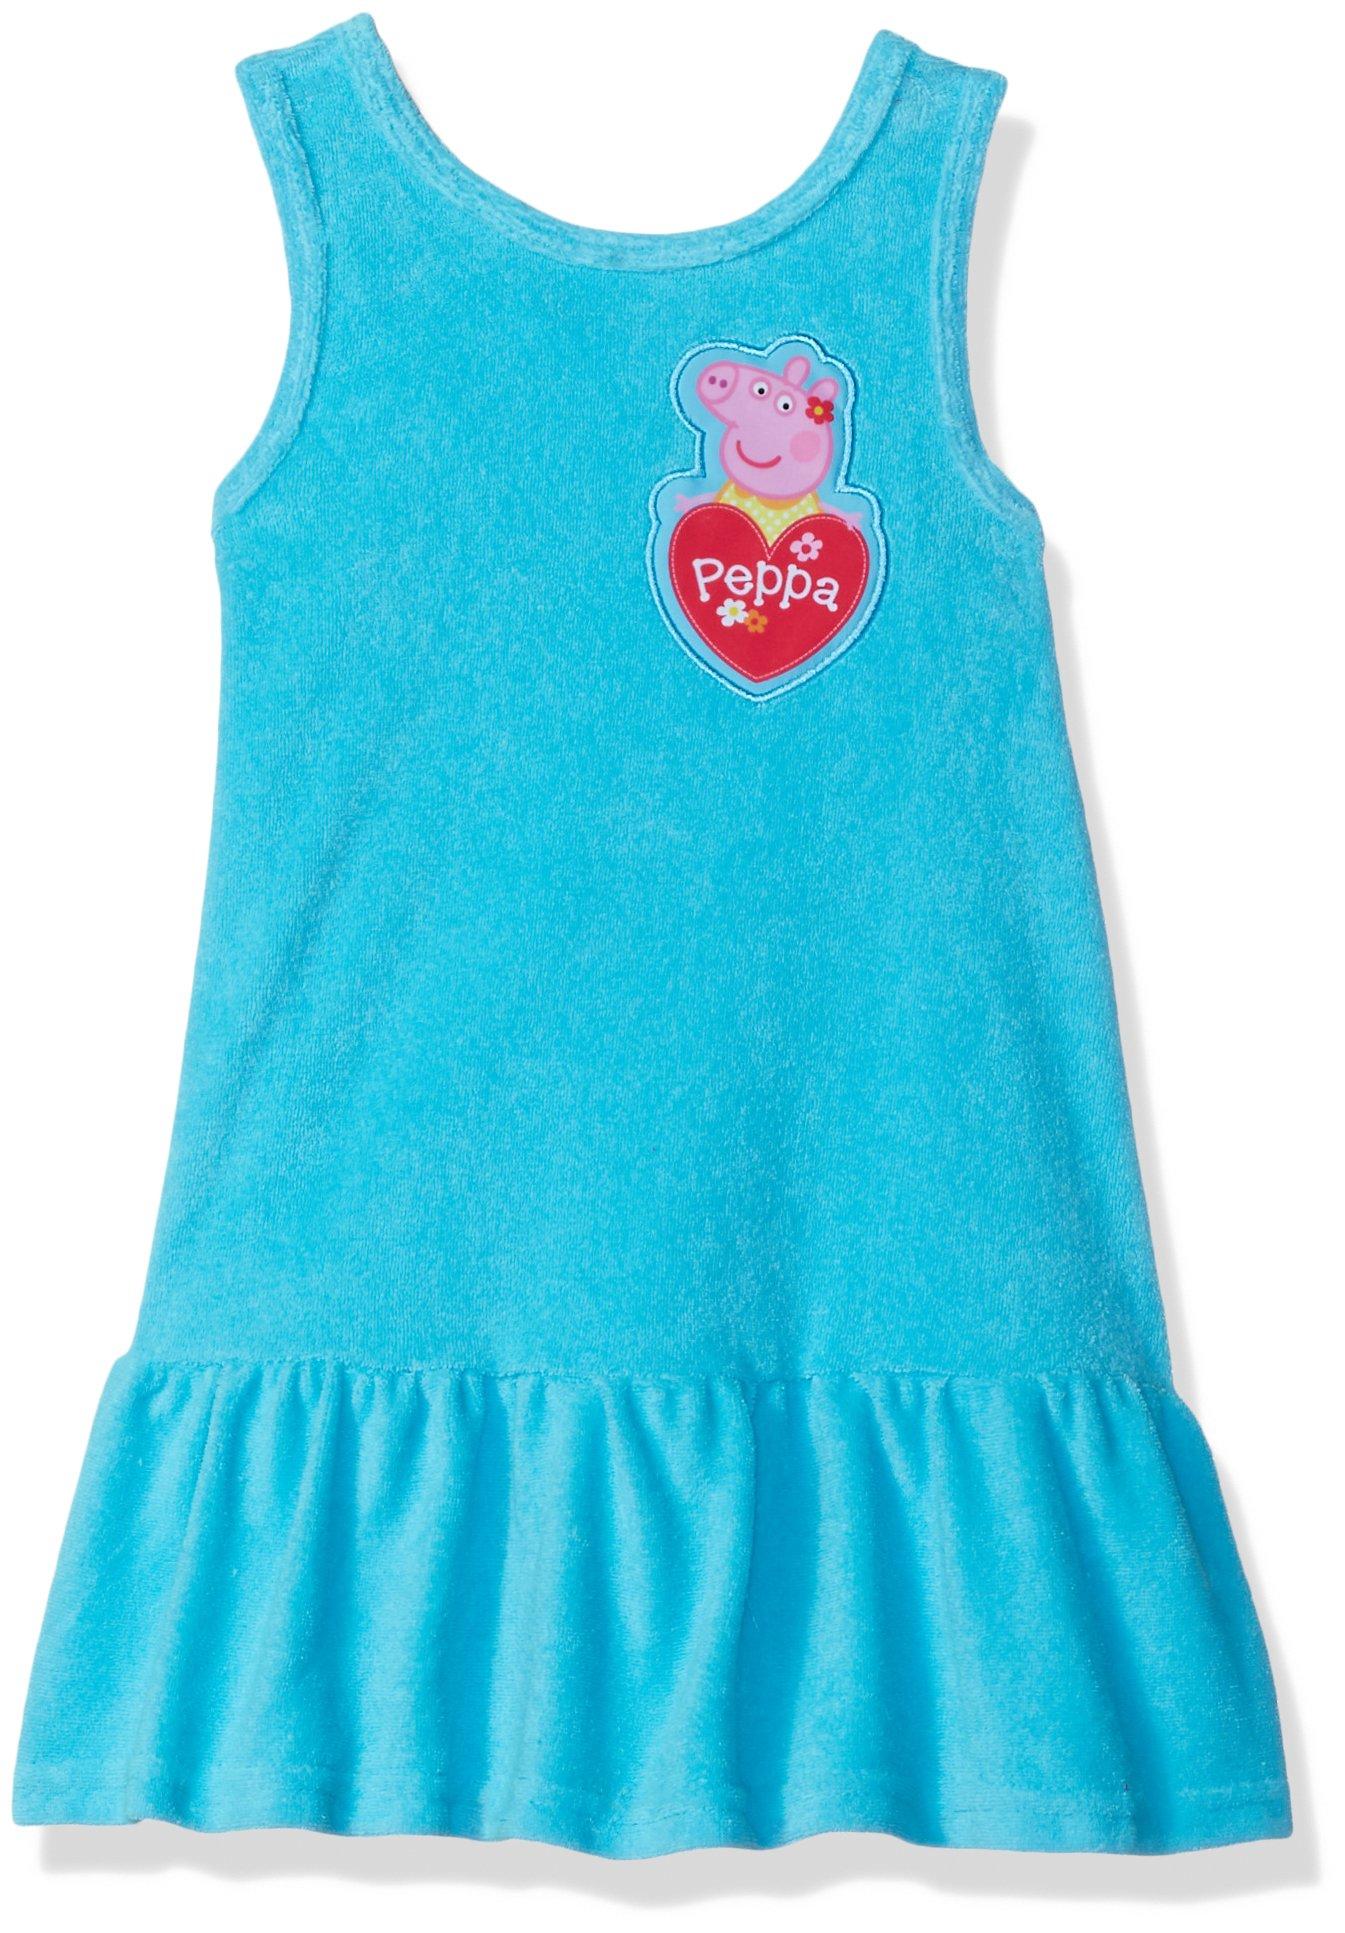 Dreamwave Toddler Girls' Peppa Big Cover up, Sky Blue, 4T